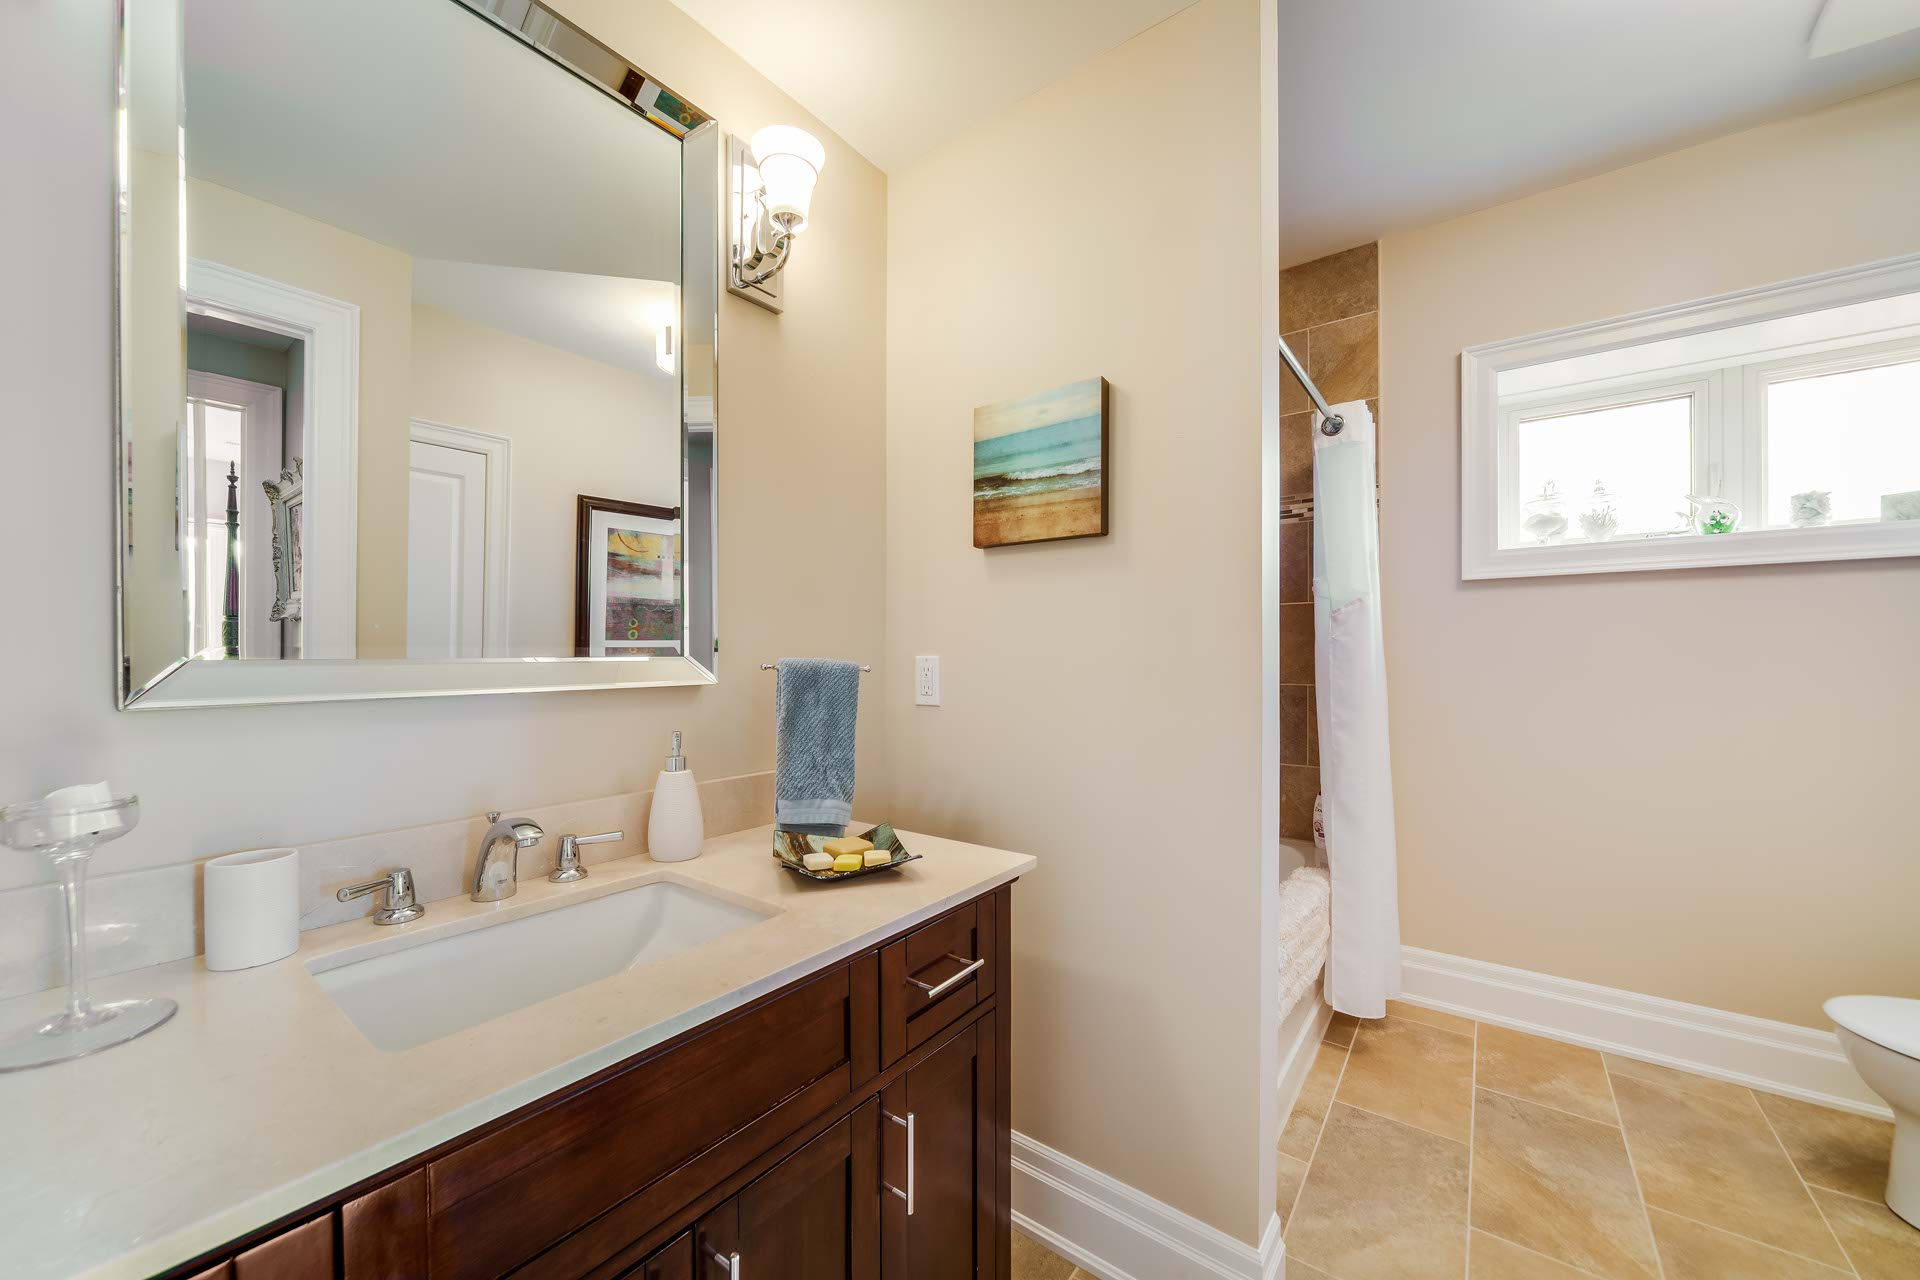 Lower bathroom 4 piece